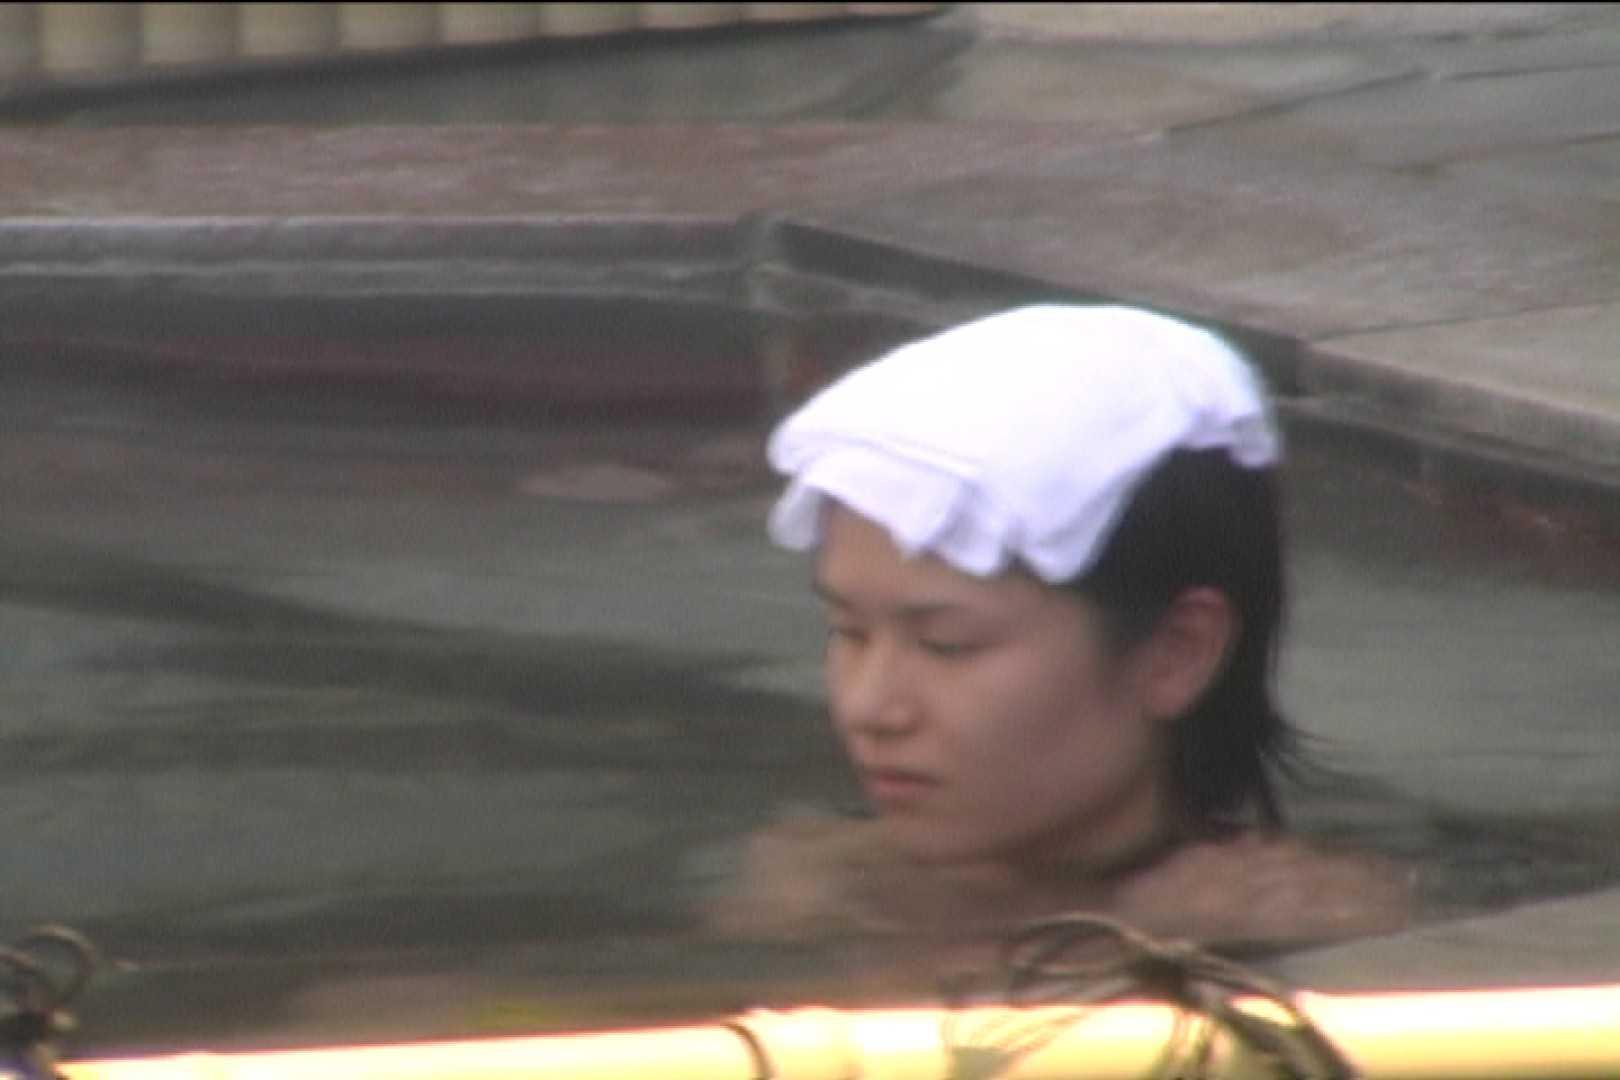 Aquaな露天風呂Vol.530 盗撮 | HなOL  88pic 1